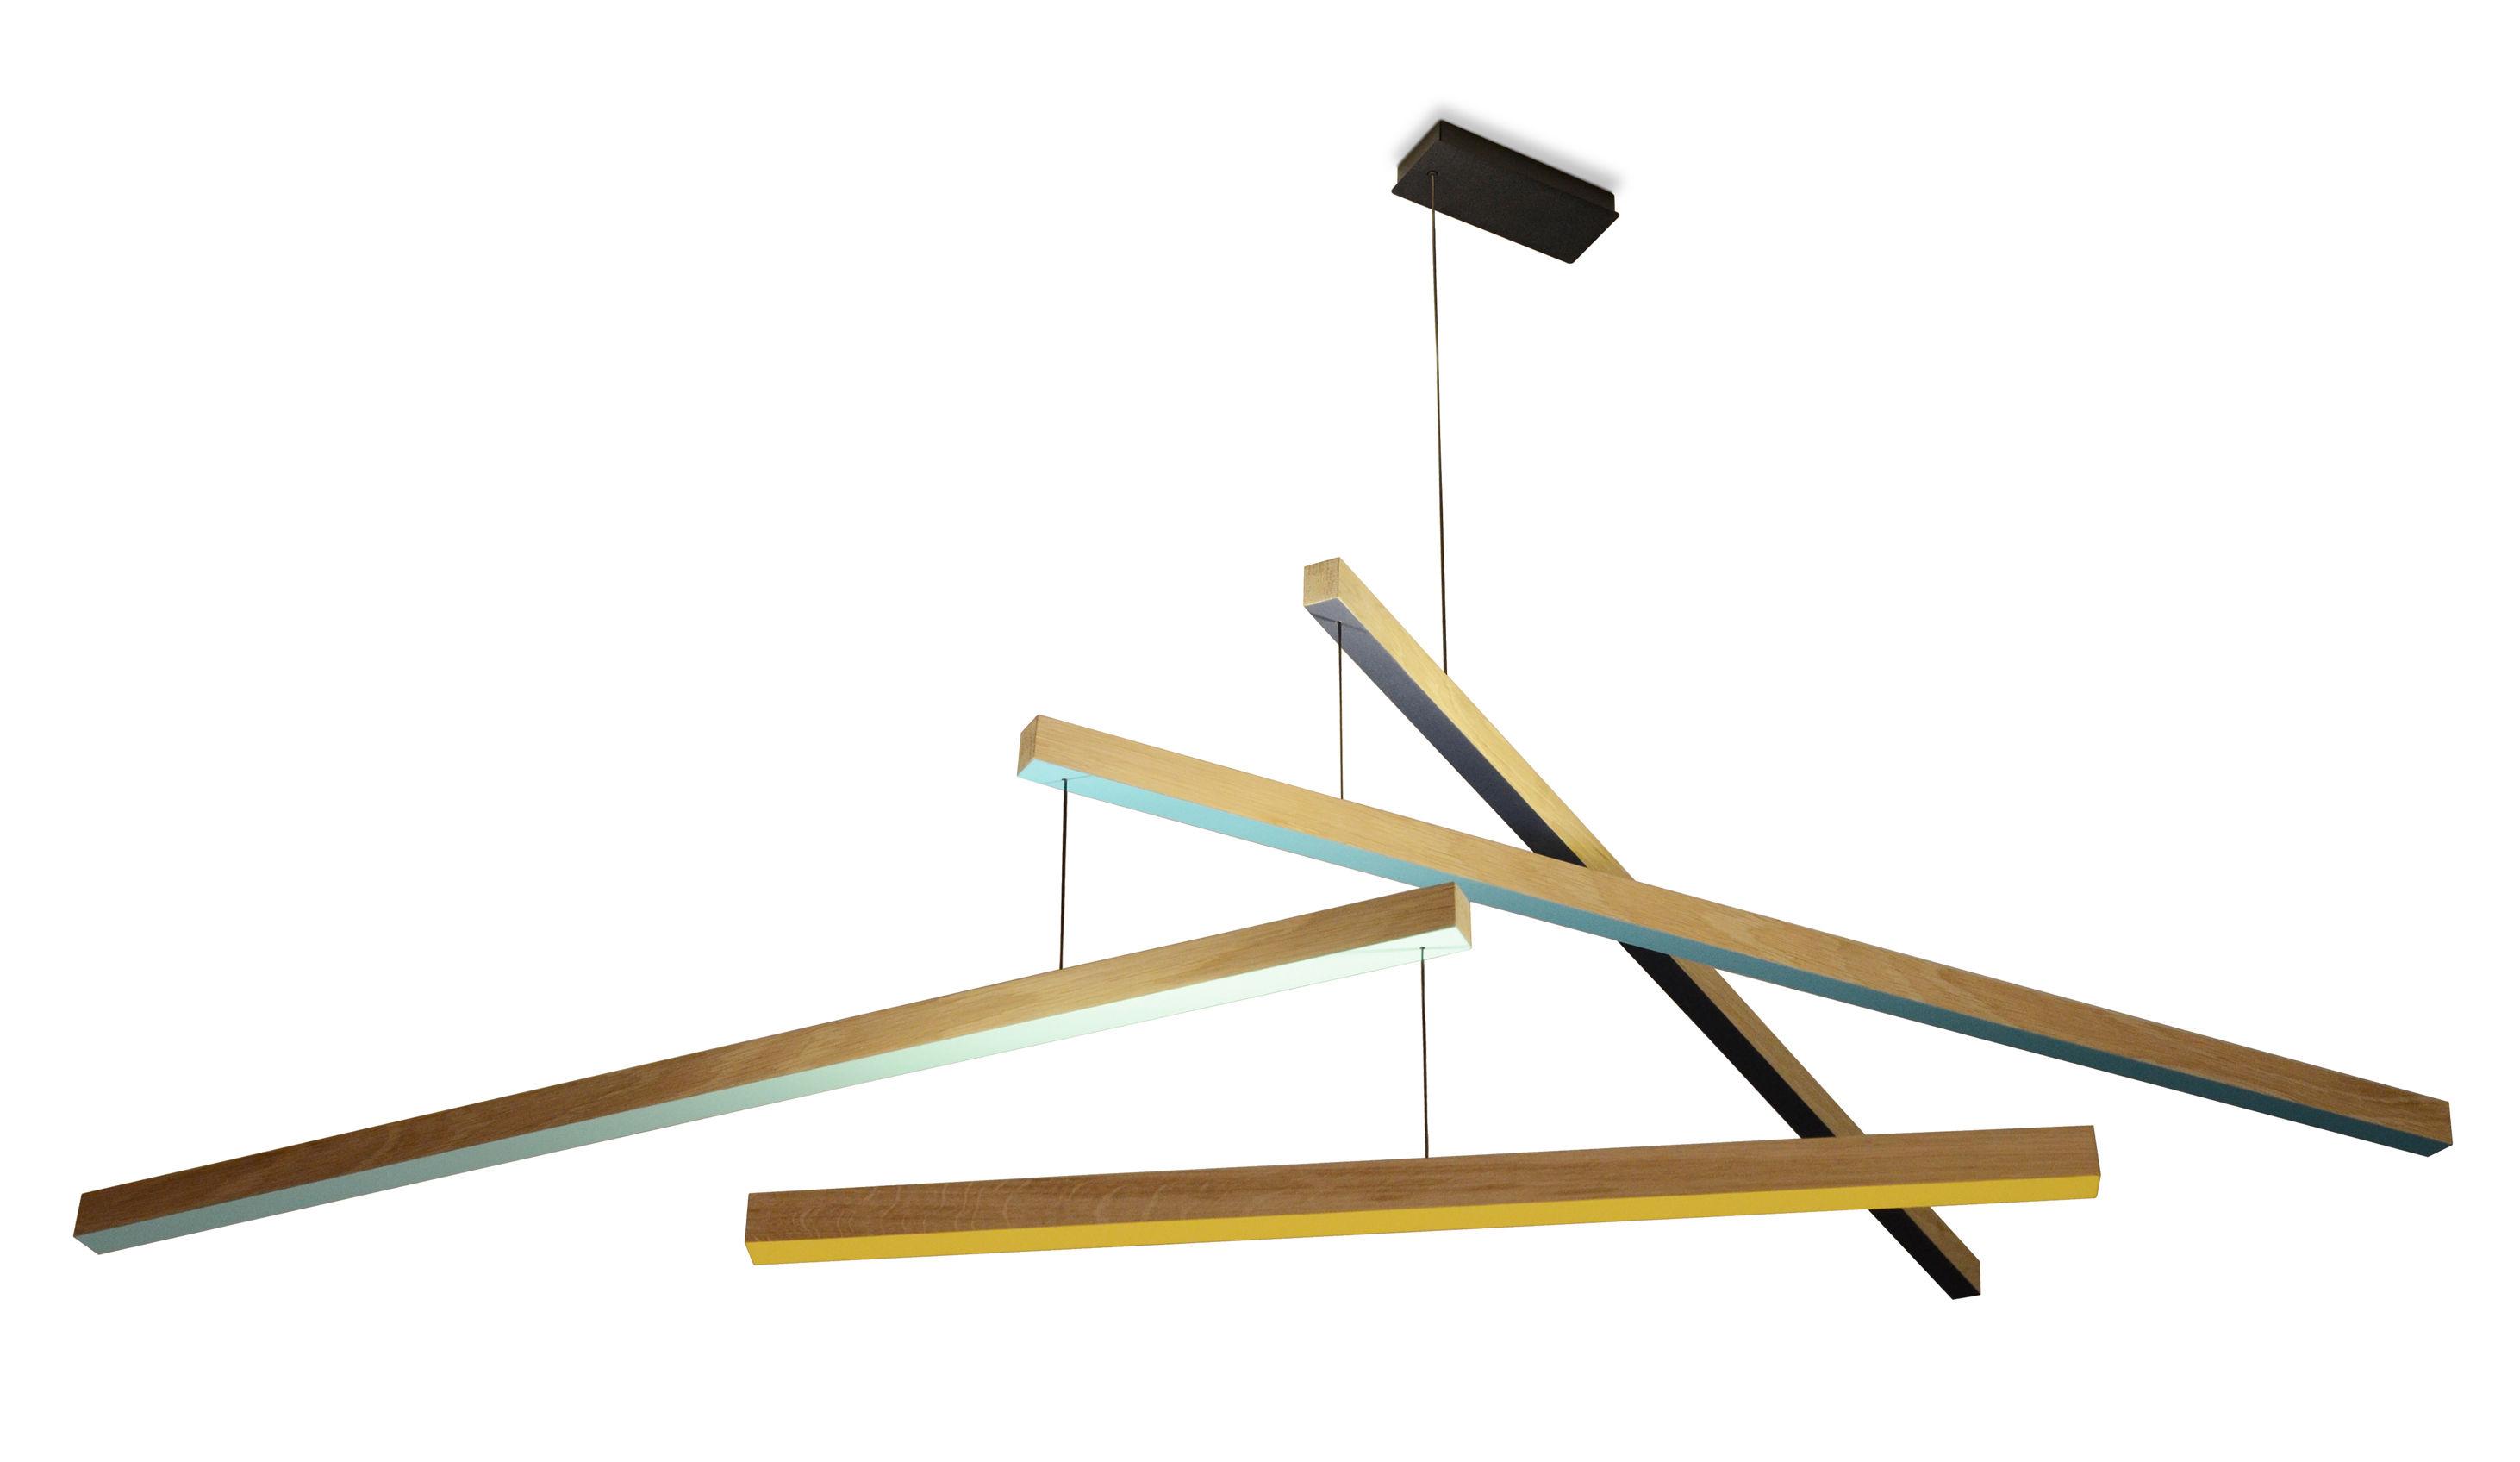 Luminaire - Suspensions - Suspension Tasso Thé LED / Chêne - L 155 cm - Presse citron - Jaune, vert, turquoise, Marine / Bois - Chêne massif